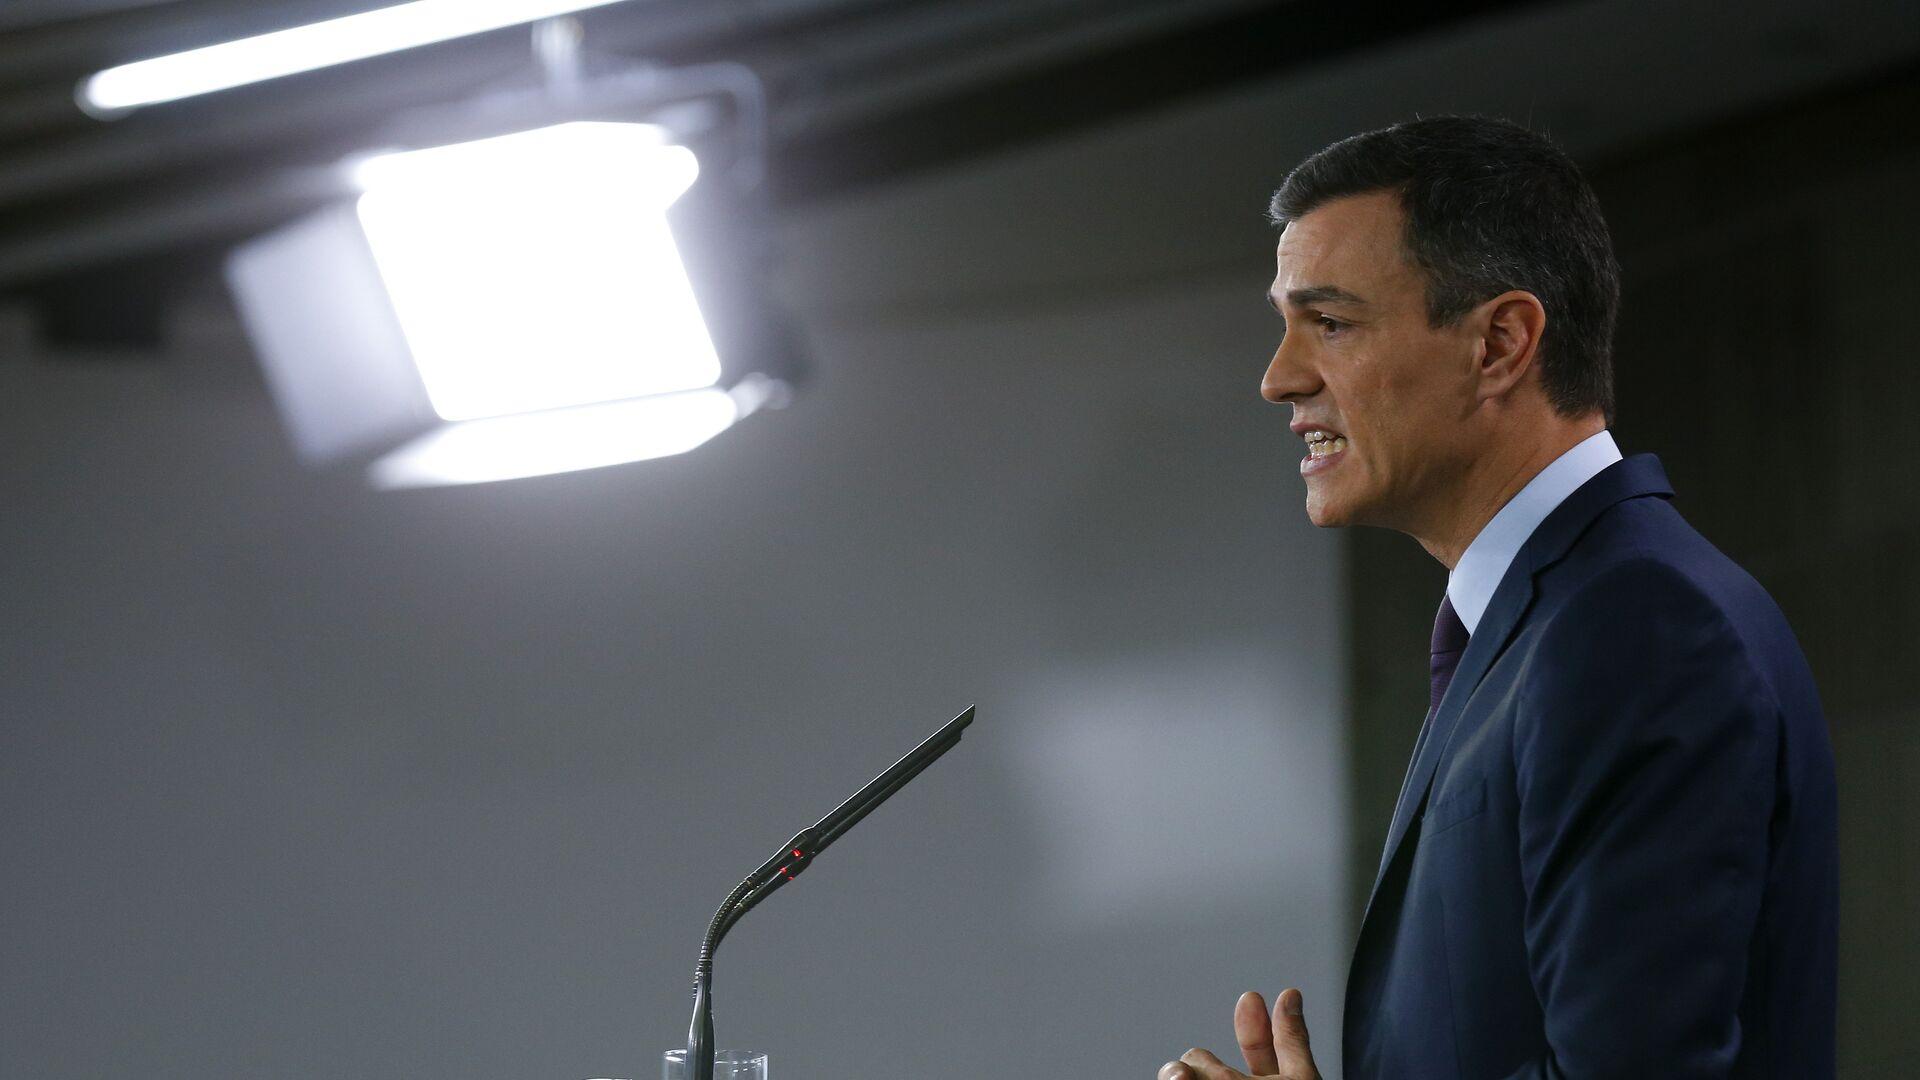 Pedro Sánchez, presidente del Gobierno de España - Sputnik Mundo, 1920, 22.09.2021